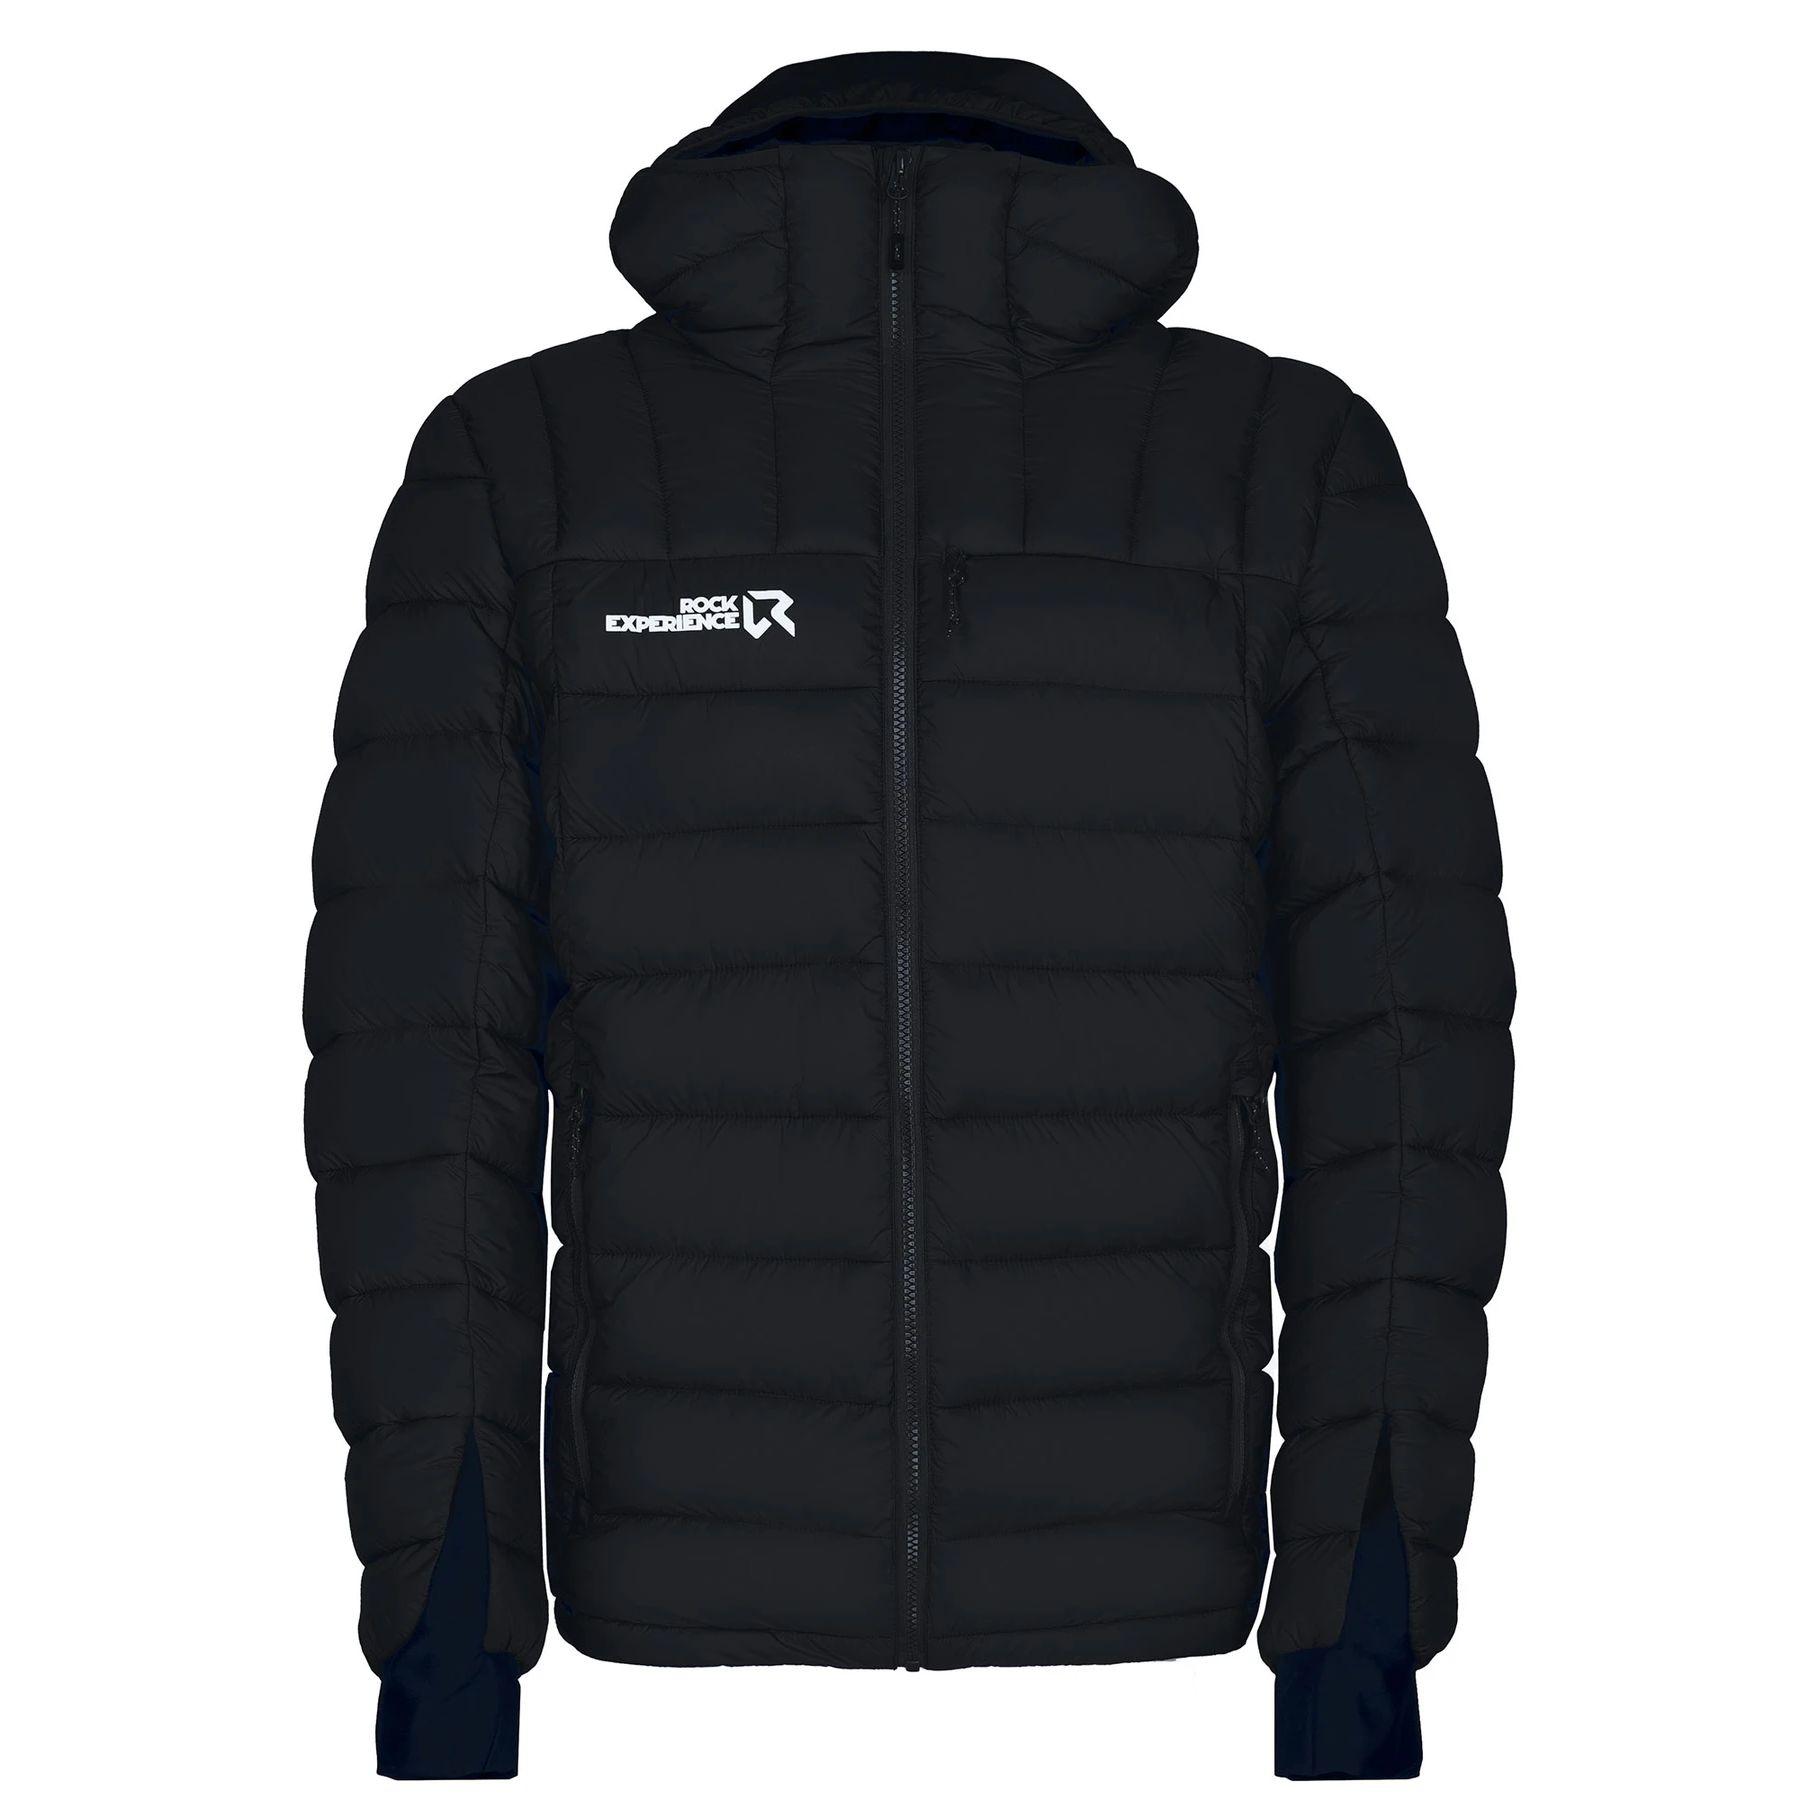 Îmbrăcăminte -  rock experience Cosmic Eco-Sustainable Padded Jacket